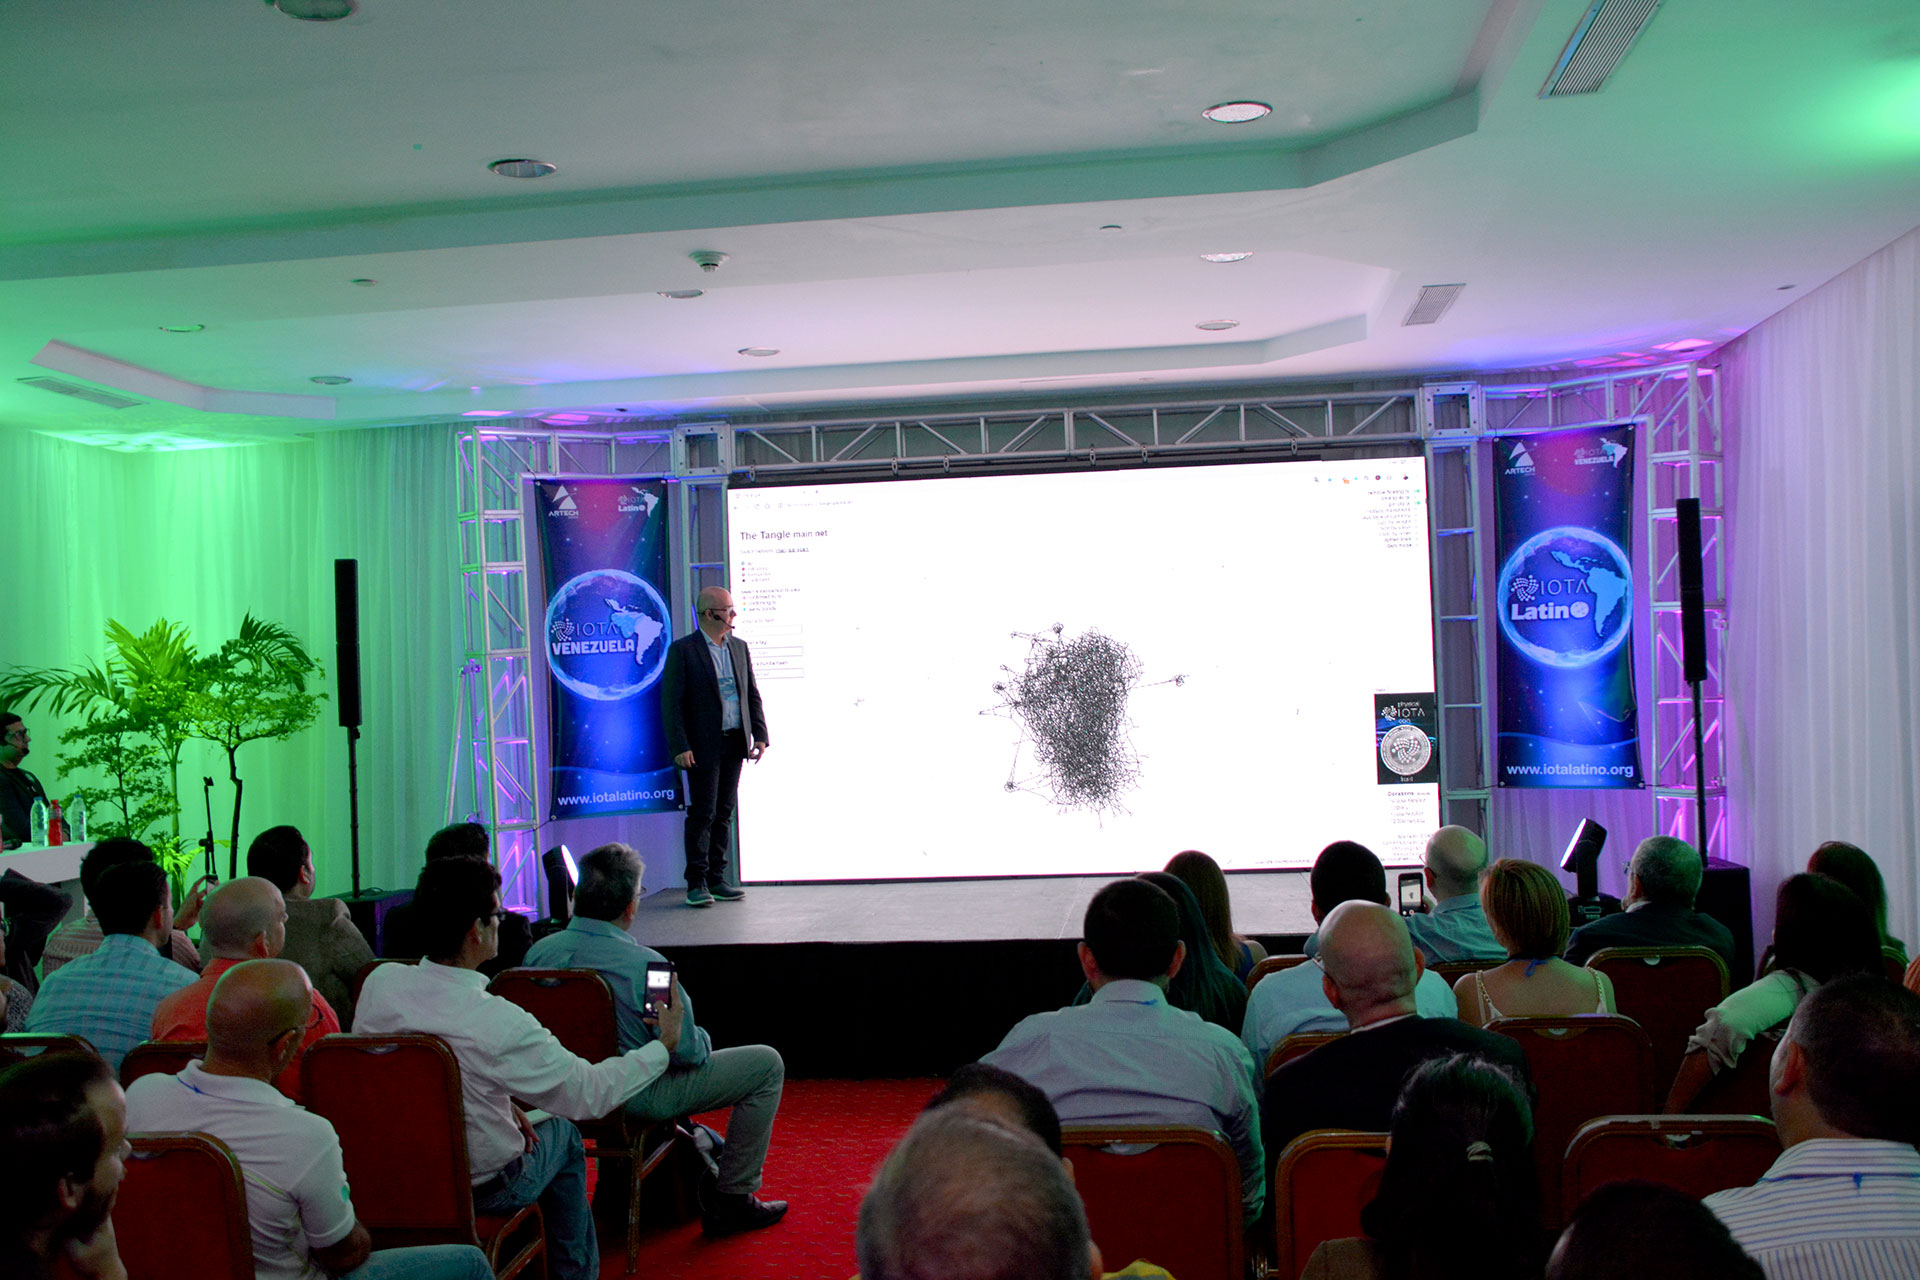 primer meetup de IOTA en Venezuela - Saul Ameliach - 2